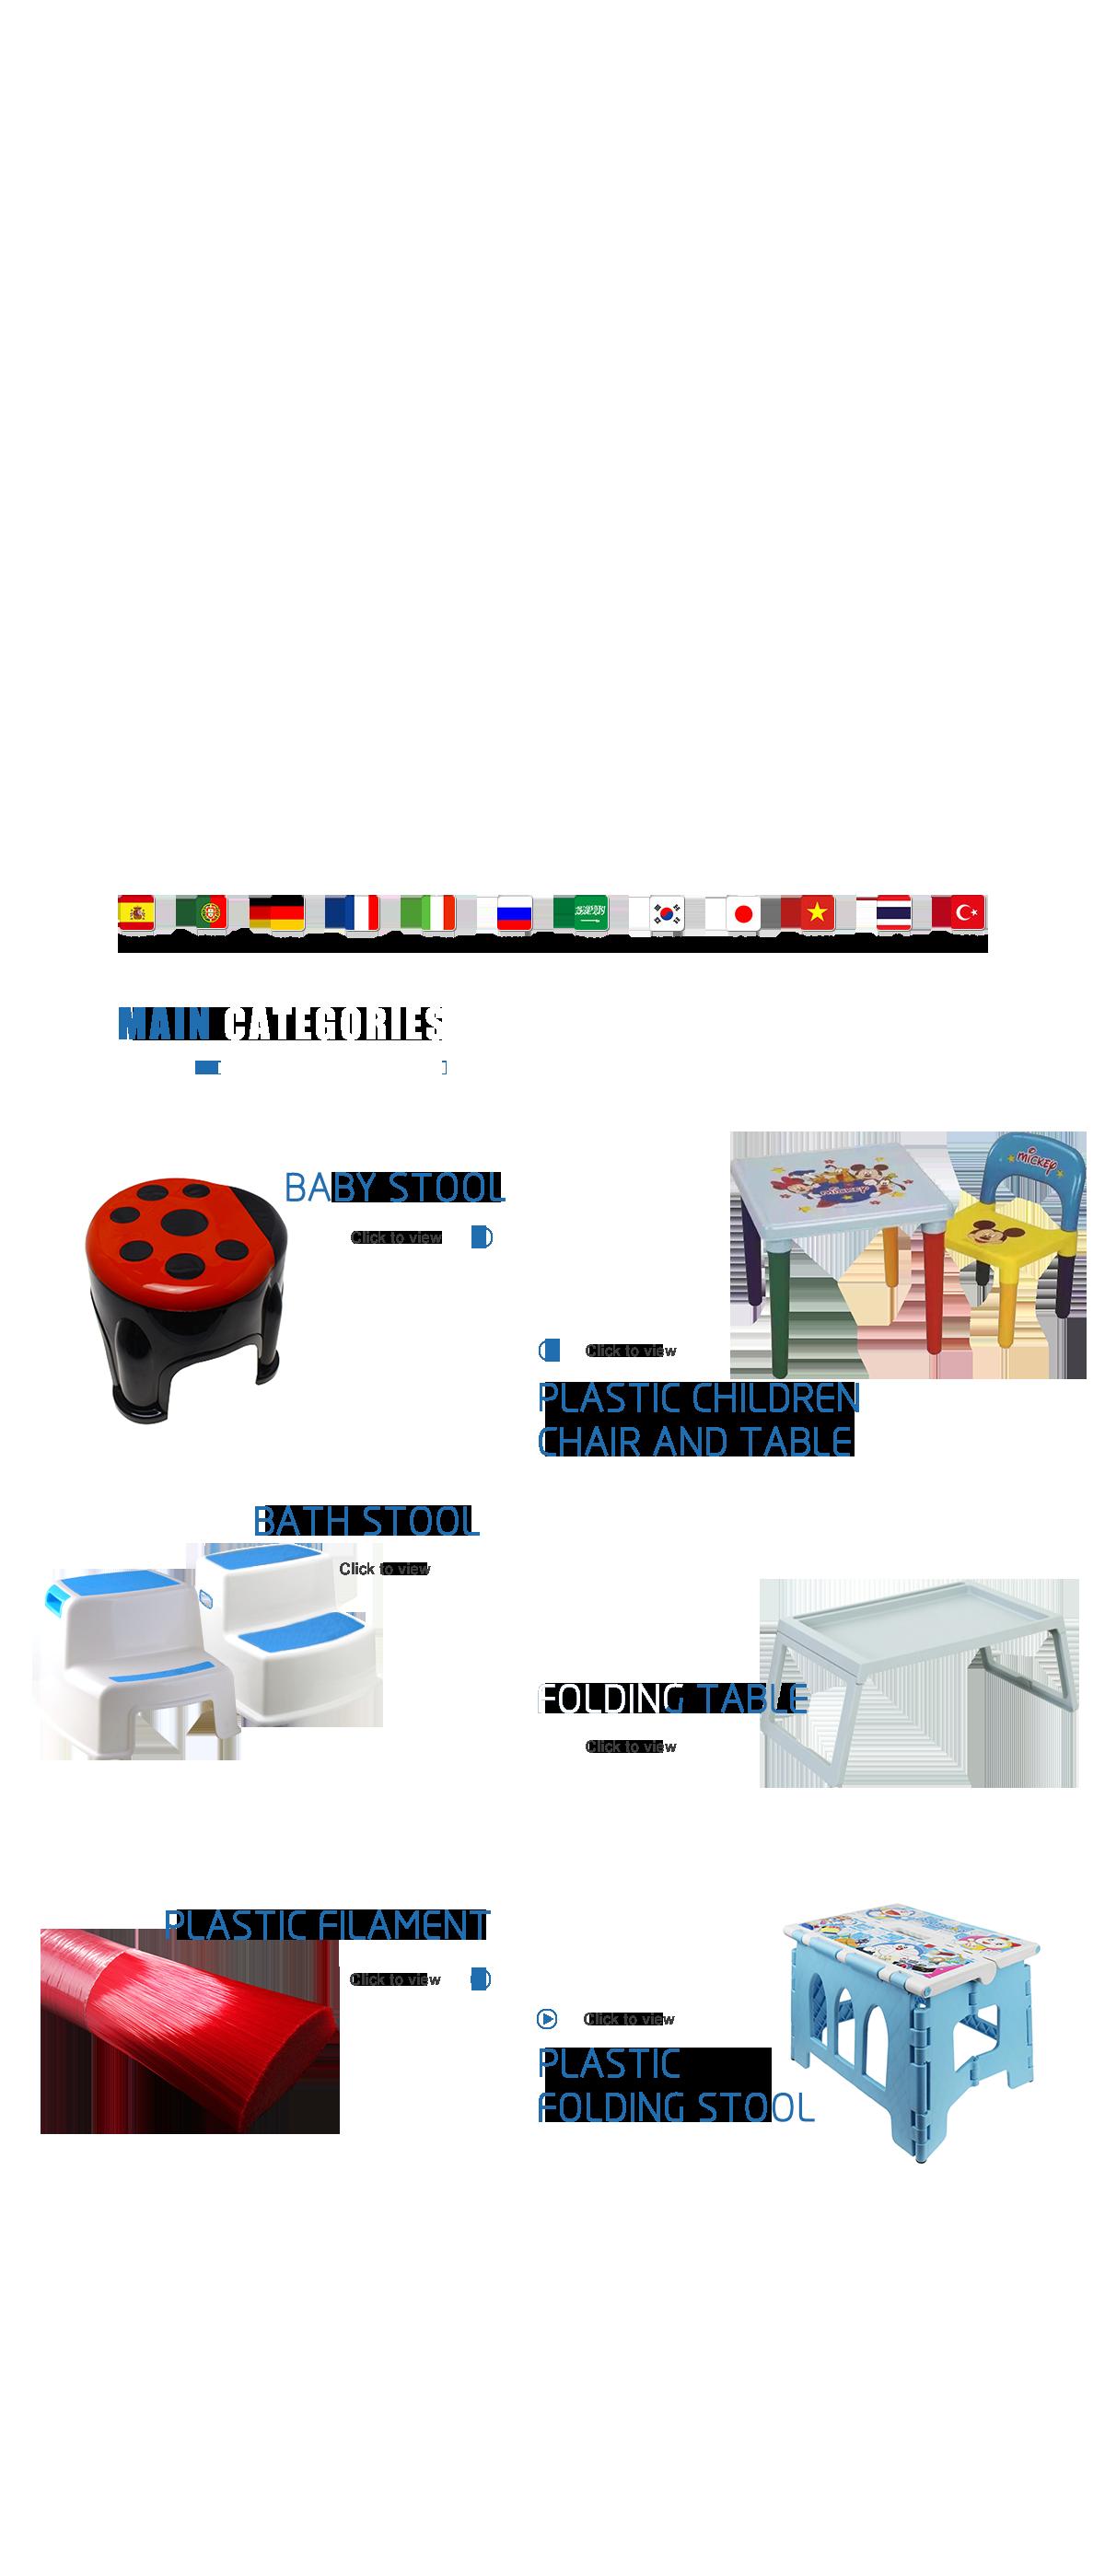 Taizhou Bebone Imp U0026 Exp Co., Ltd.   Furniture And Commodity, Household And  Toys